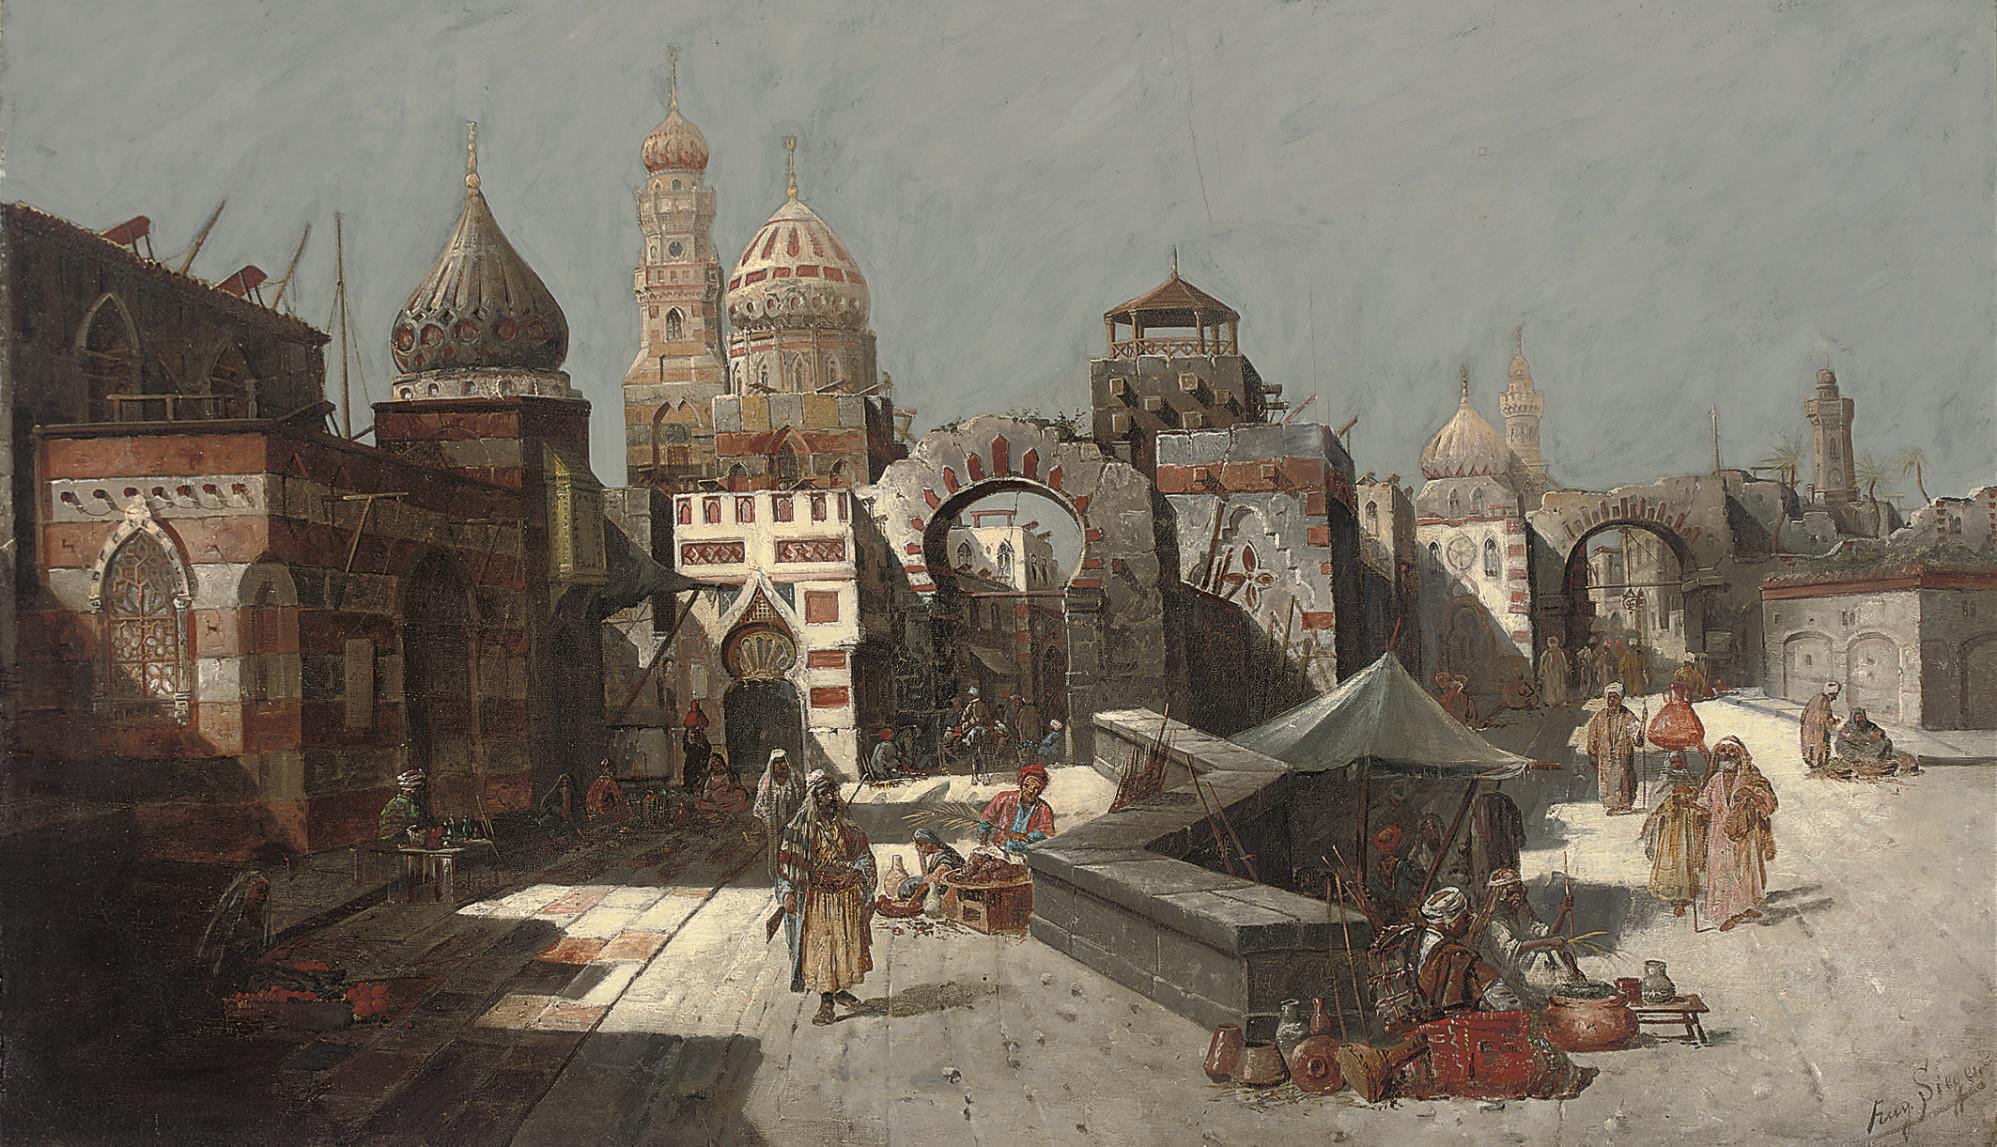 Traders at the city gates